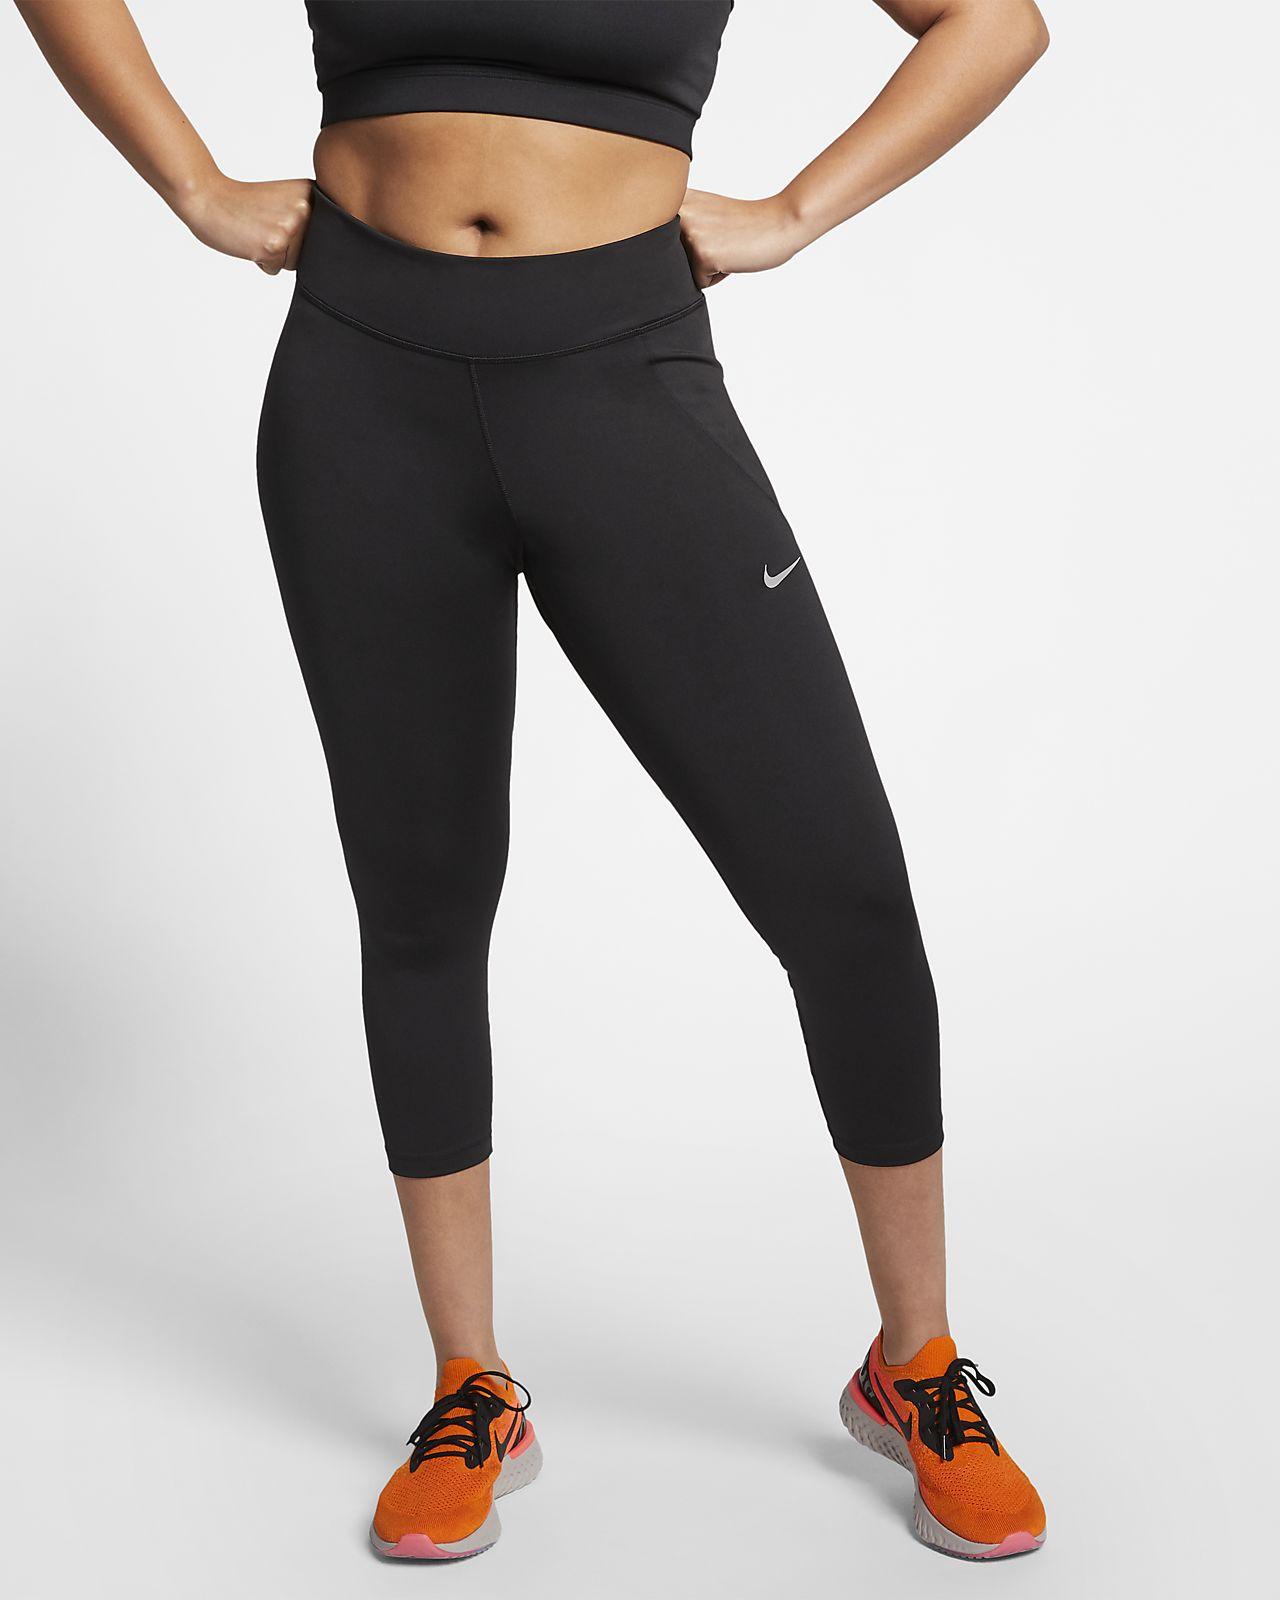 Pescadores de running de 3/4 para mujer (talla grande) Nike Fast